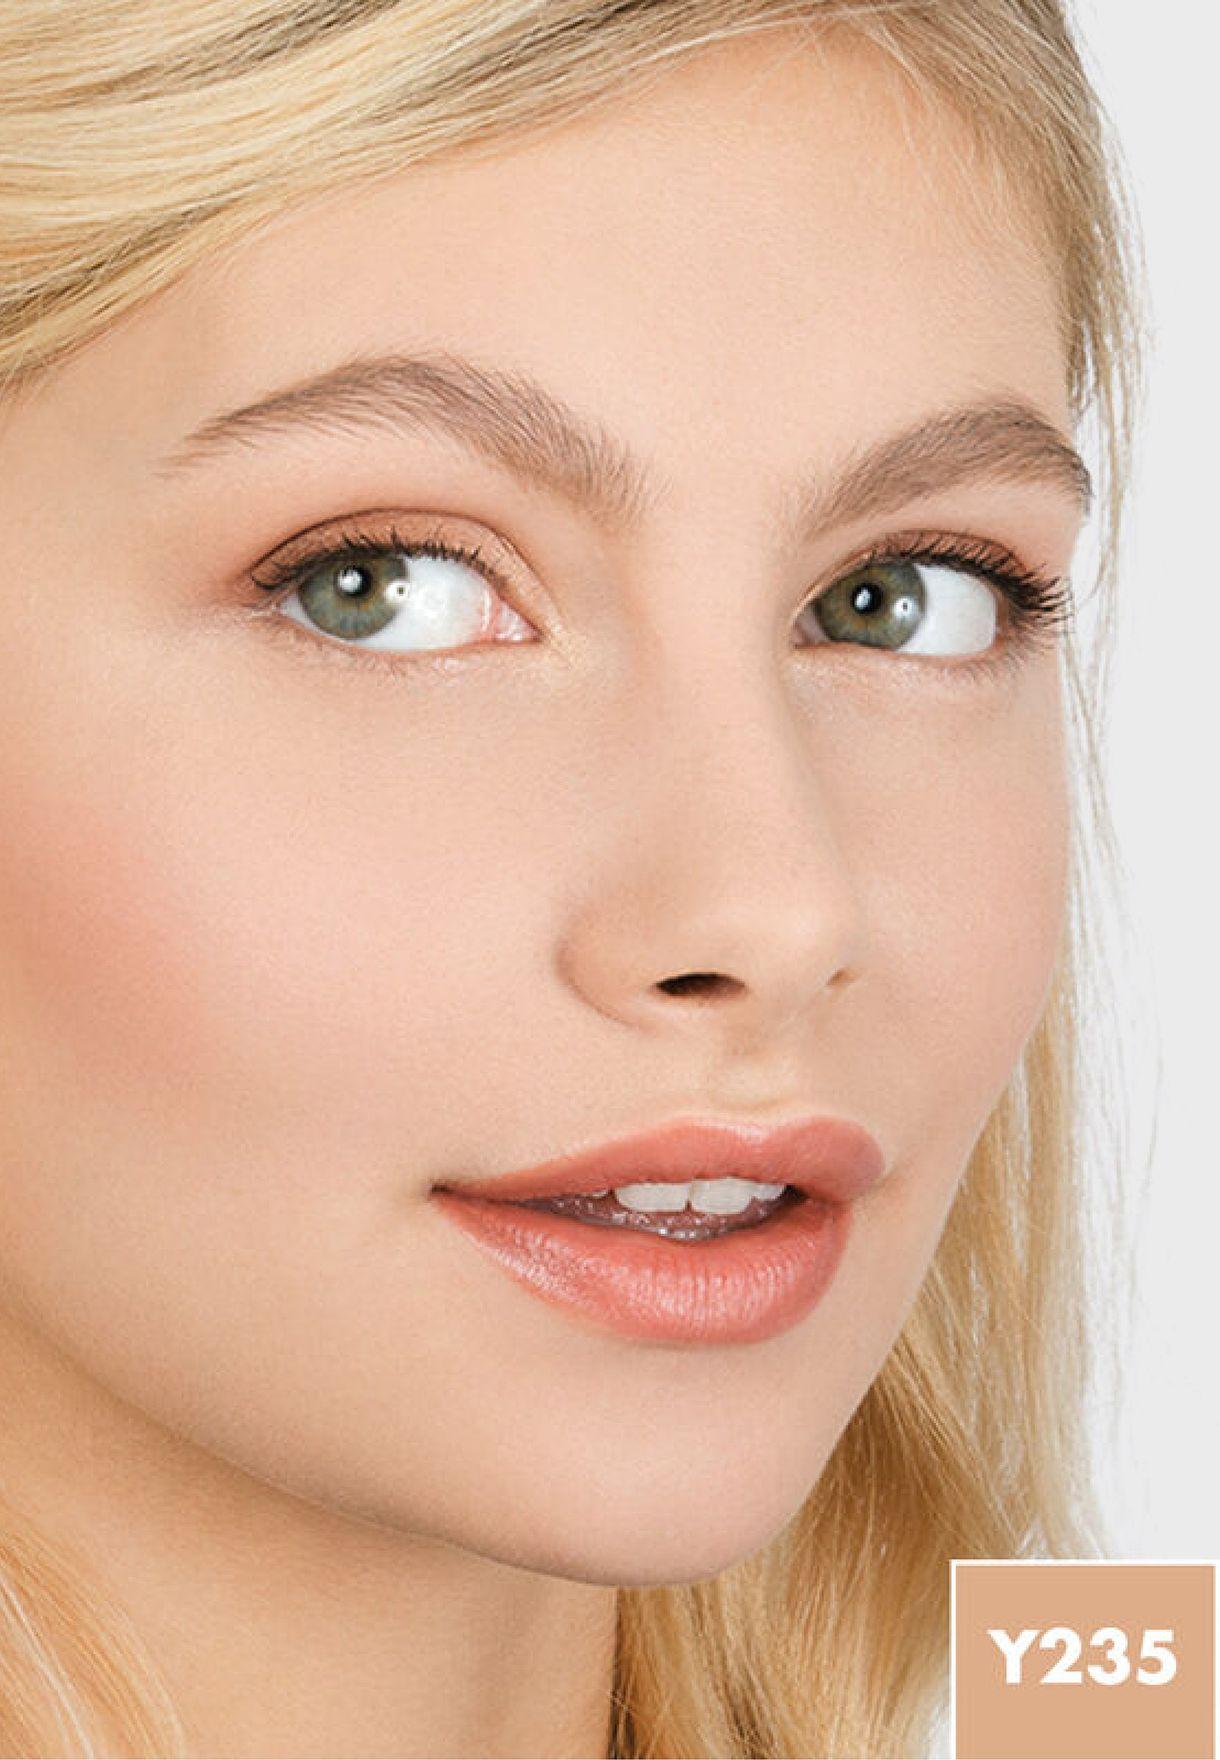 Matte Velvet Skin Compact Y235 Ivory Beige